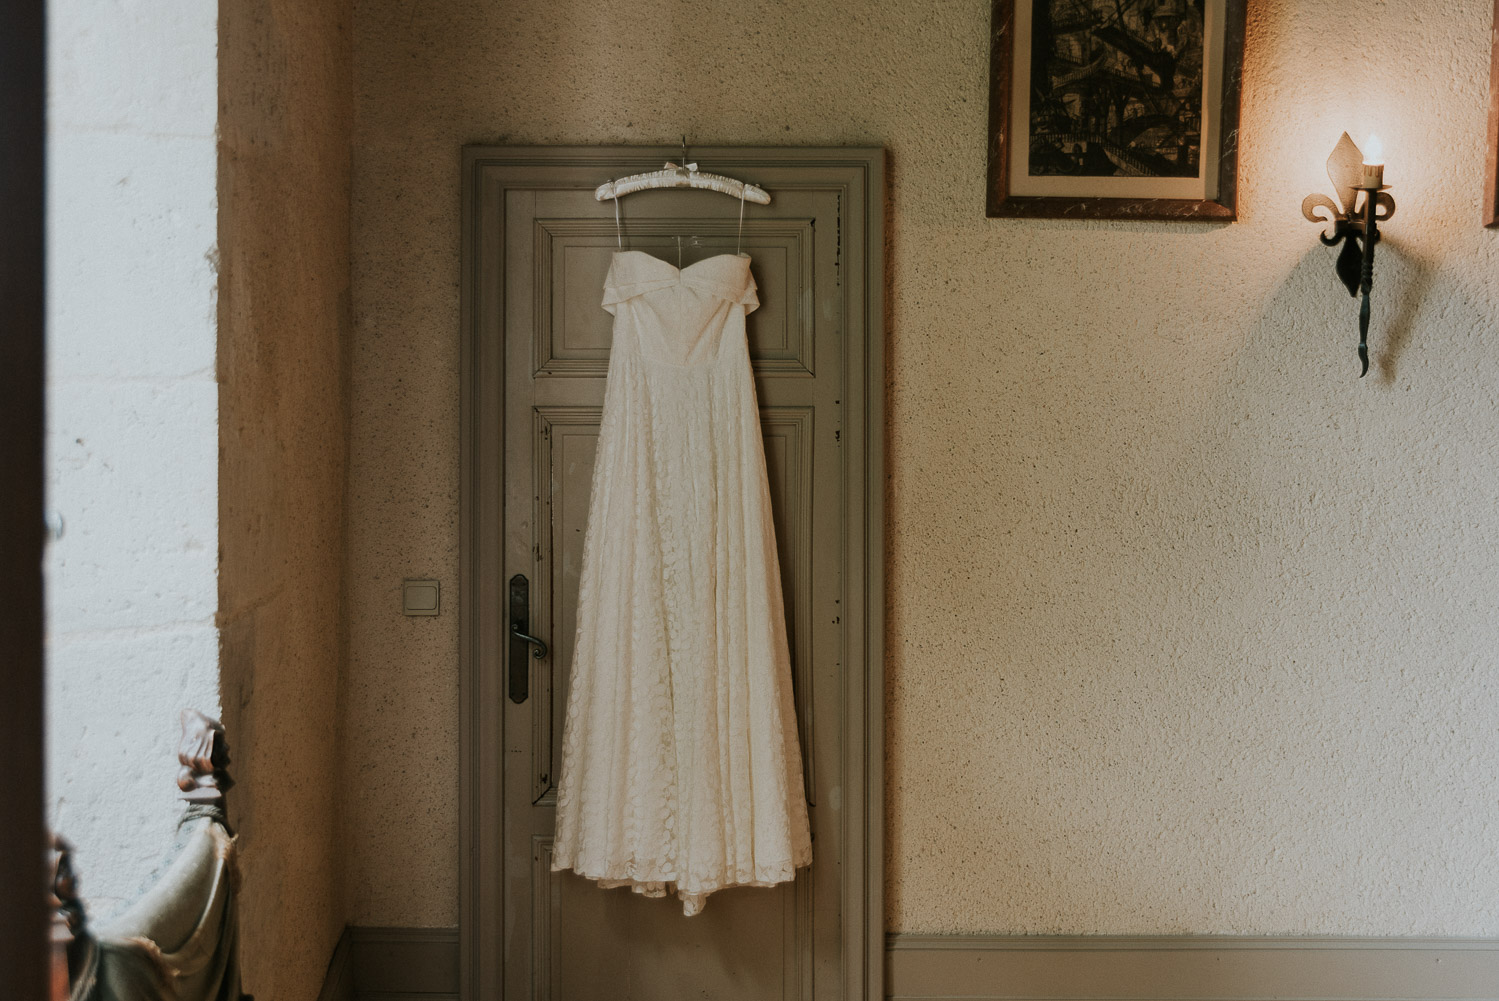 chateau_de_lisse_gers_wedding_katy_webb_photography_france_UK4